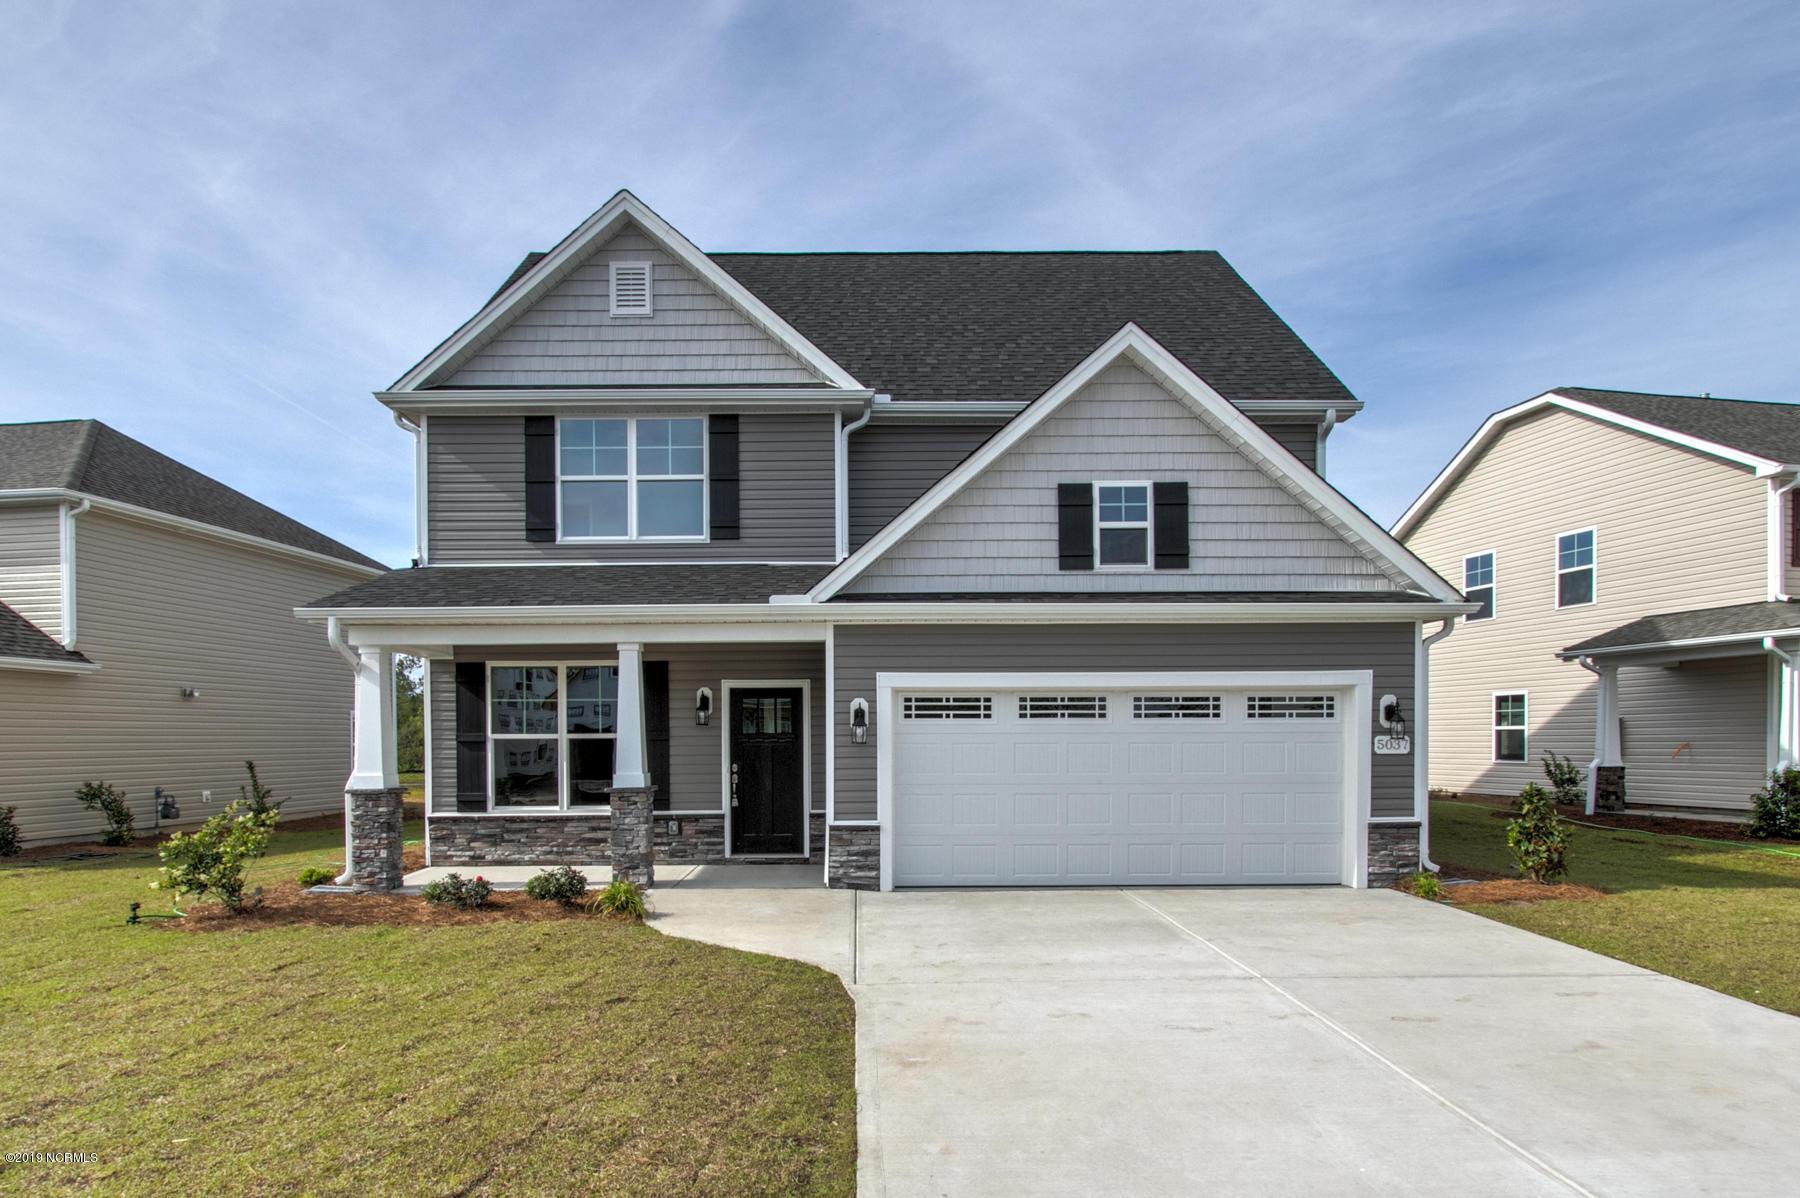 2609 Longleaf Pine Circle Leland, NC 28451